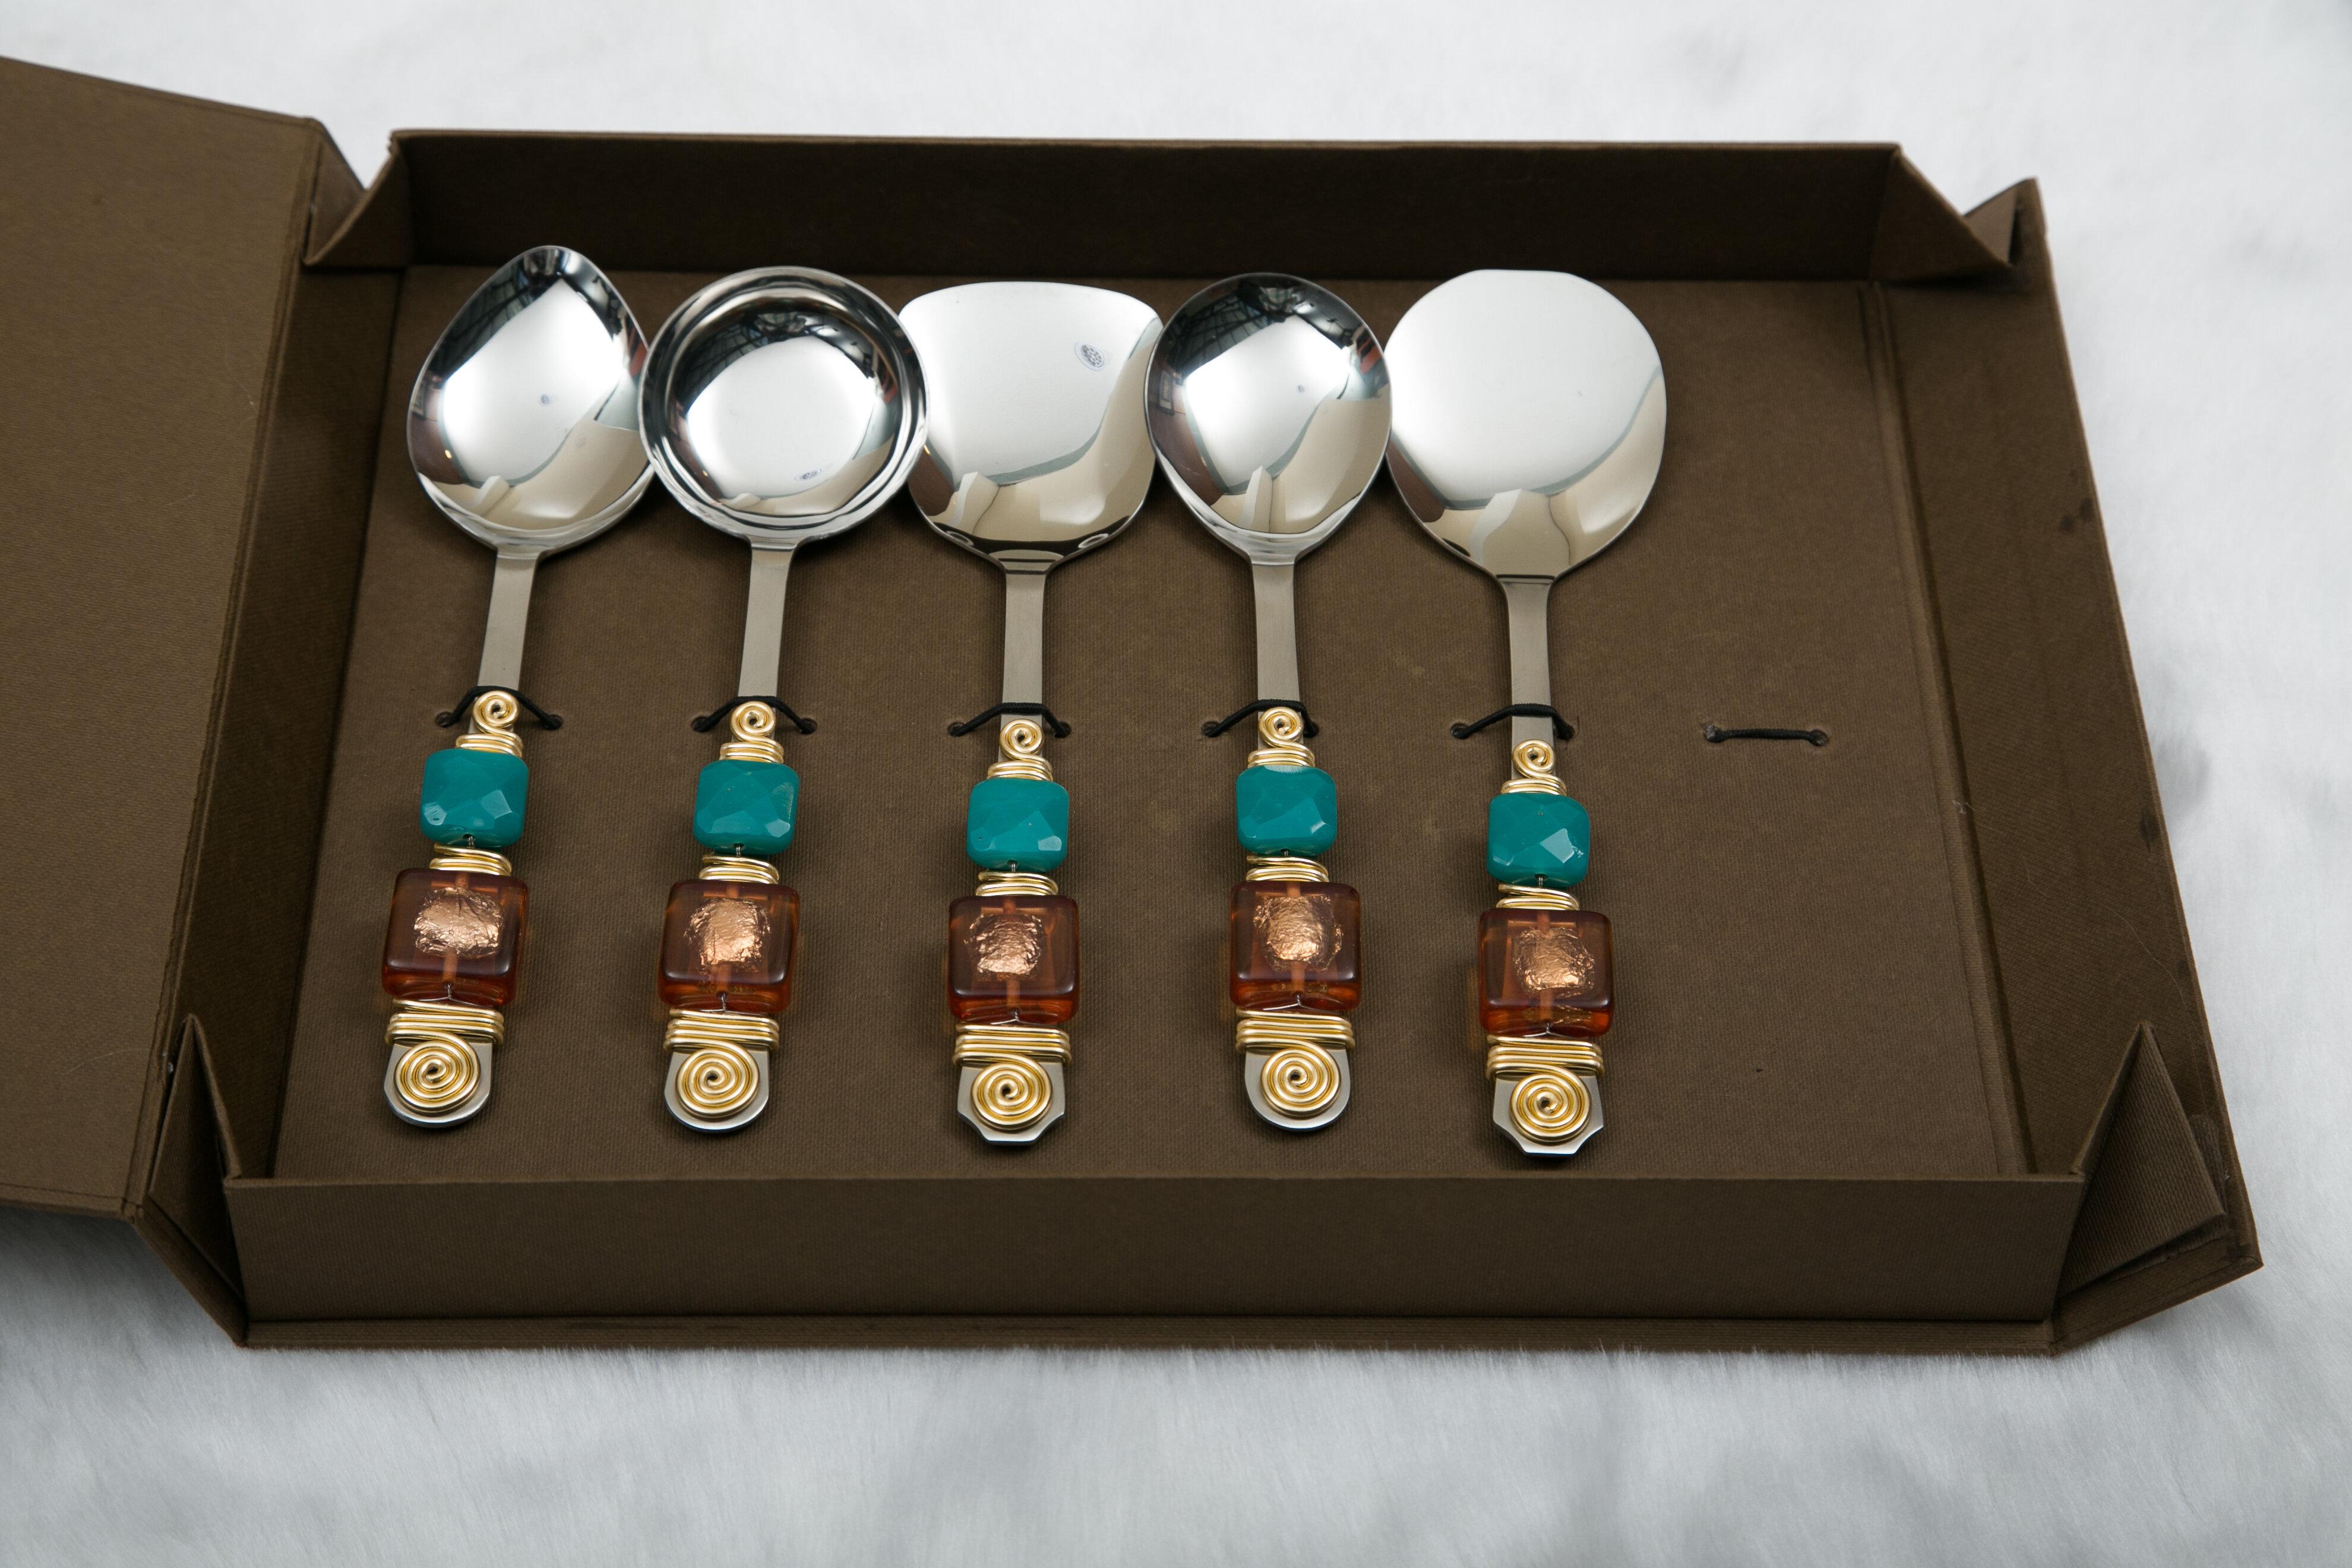 5-Piece Hostess Set Serving Utensil Kitchen Multi-Color Spoon Fork Sugar Shell